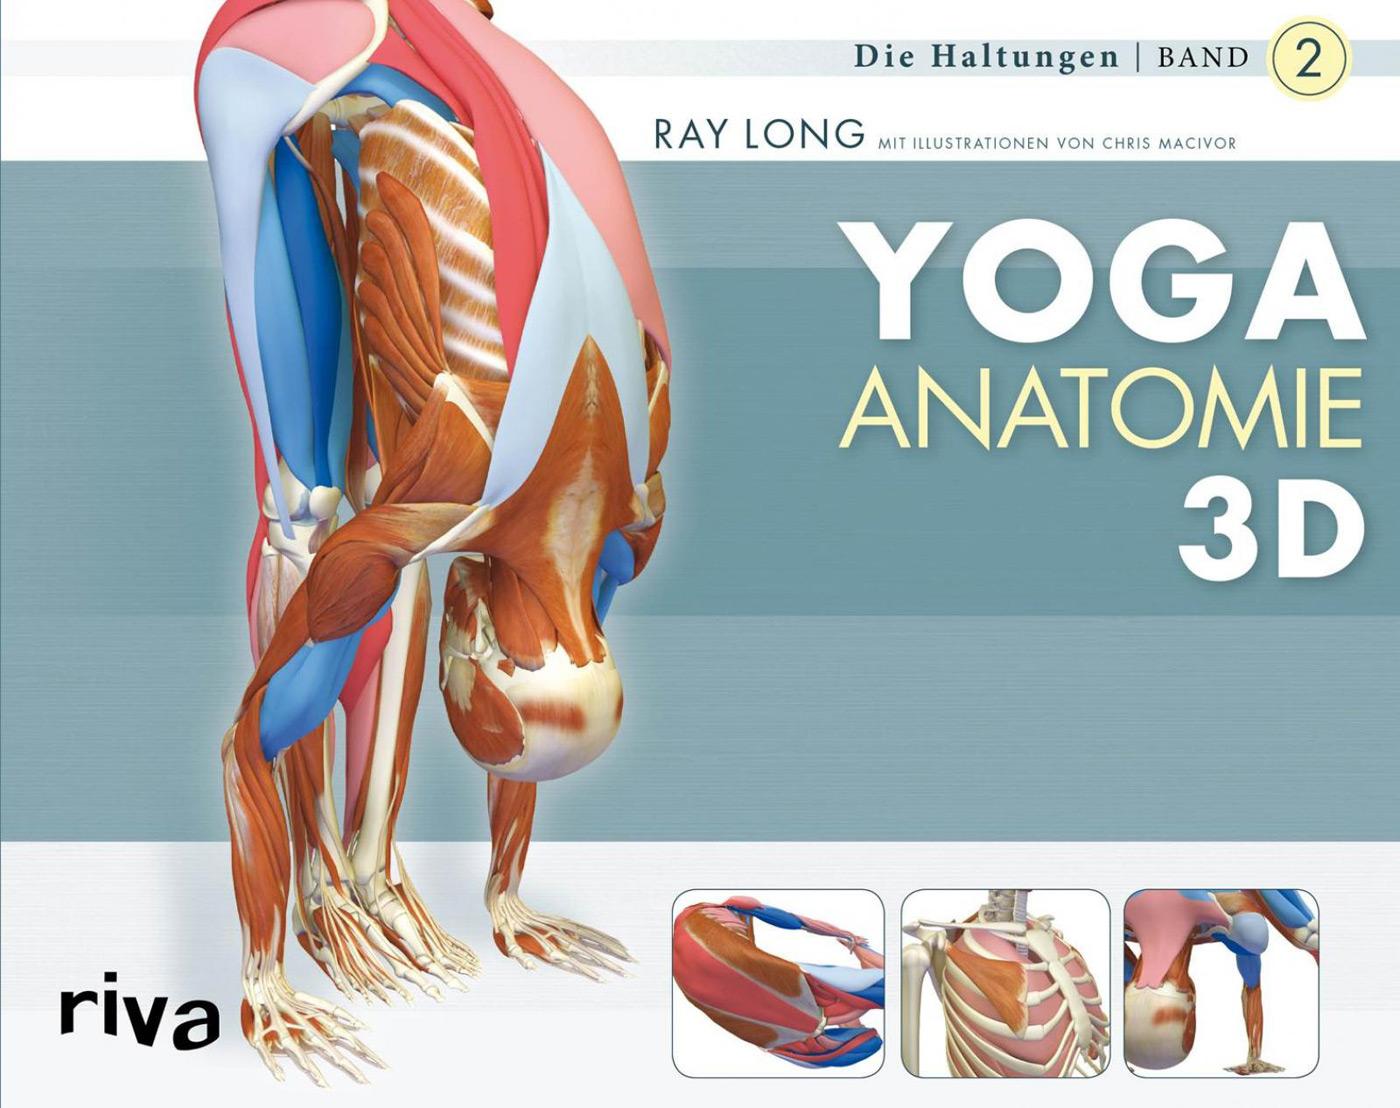 Yoga Anatomie 3D, Band 2 von Ray Long im YOGISHOP kaufen | Yoga ...